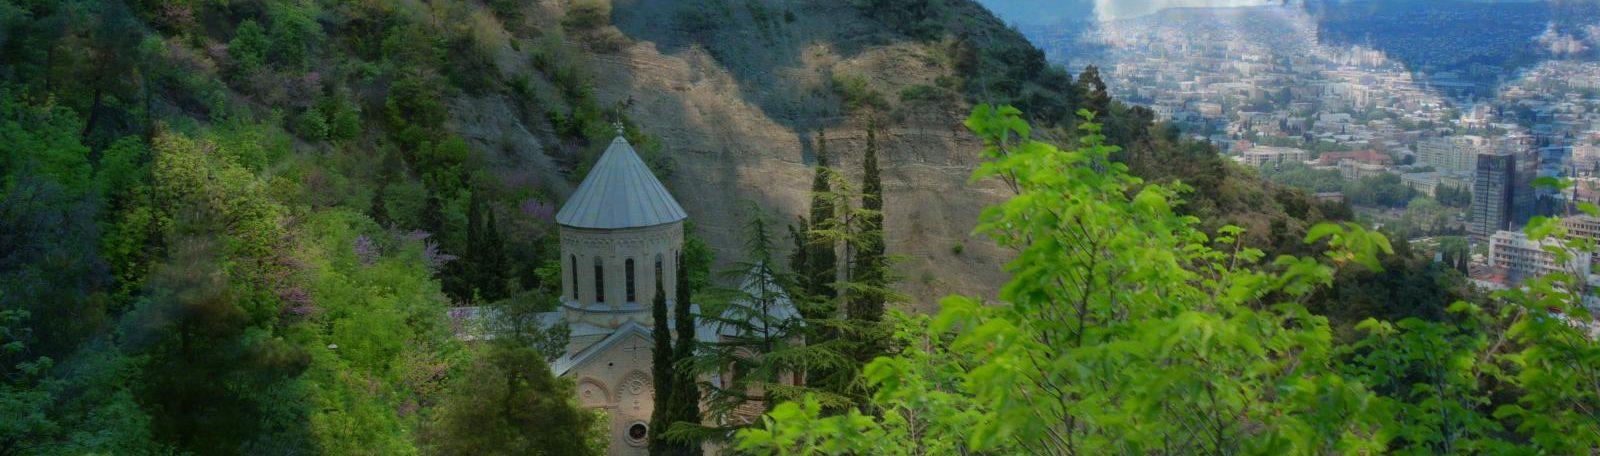 Гора Мтацминда: Пантеон